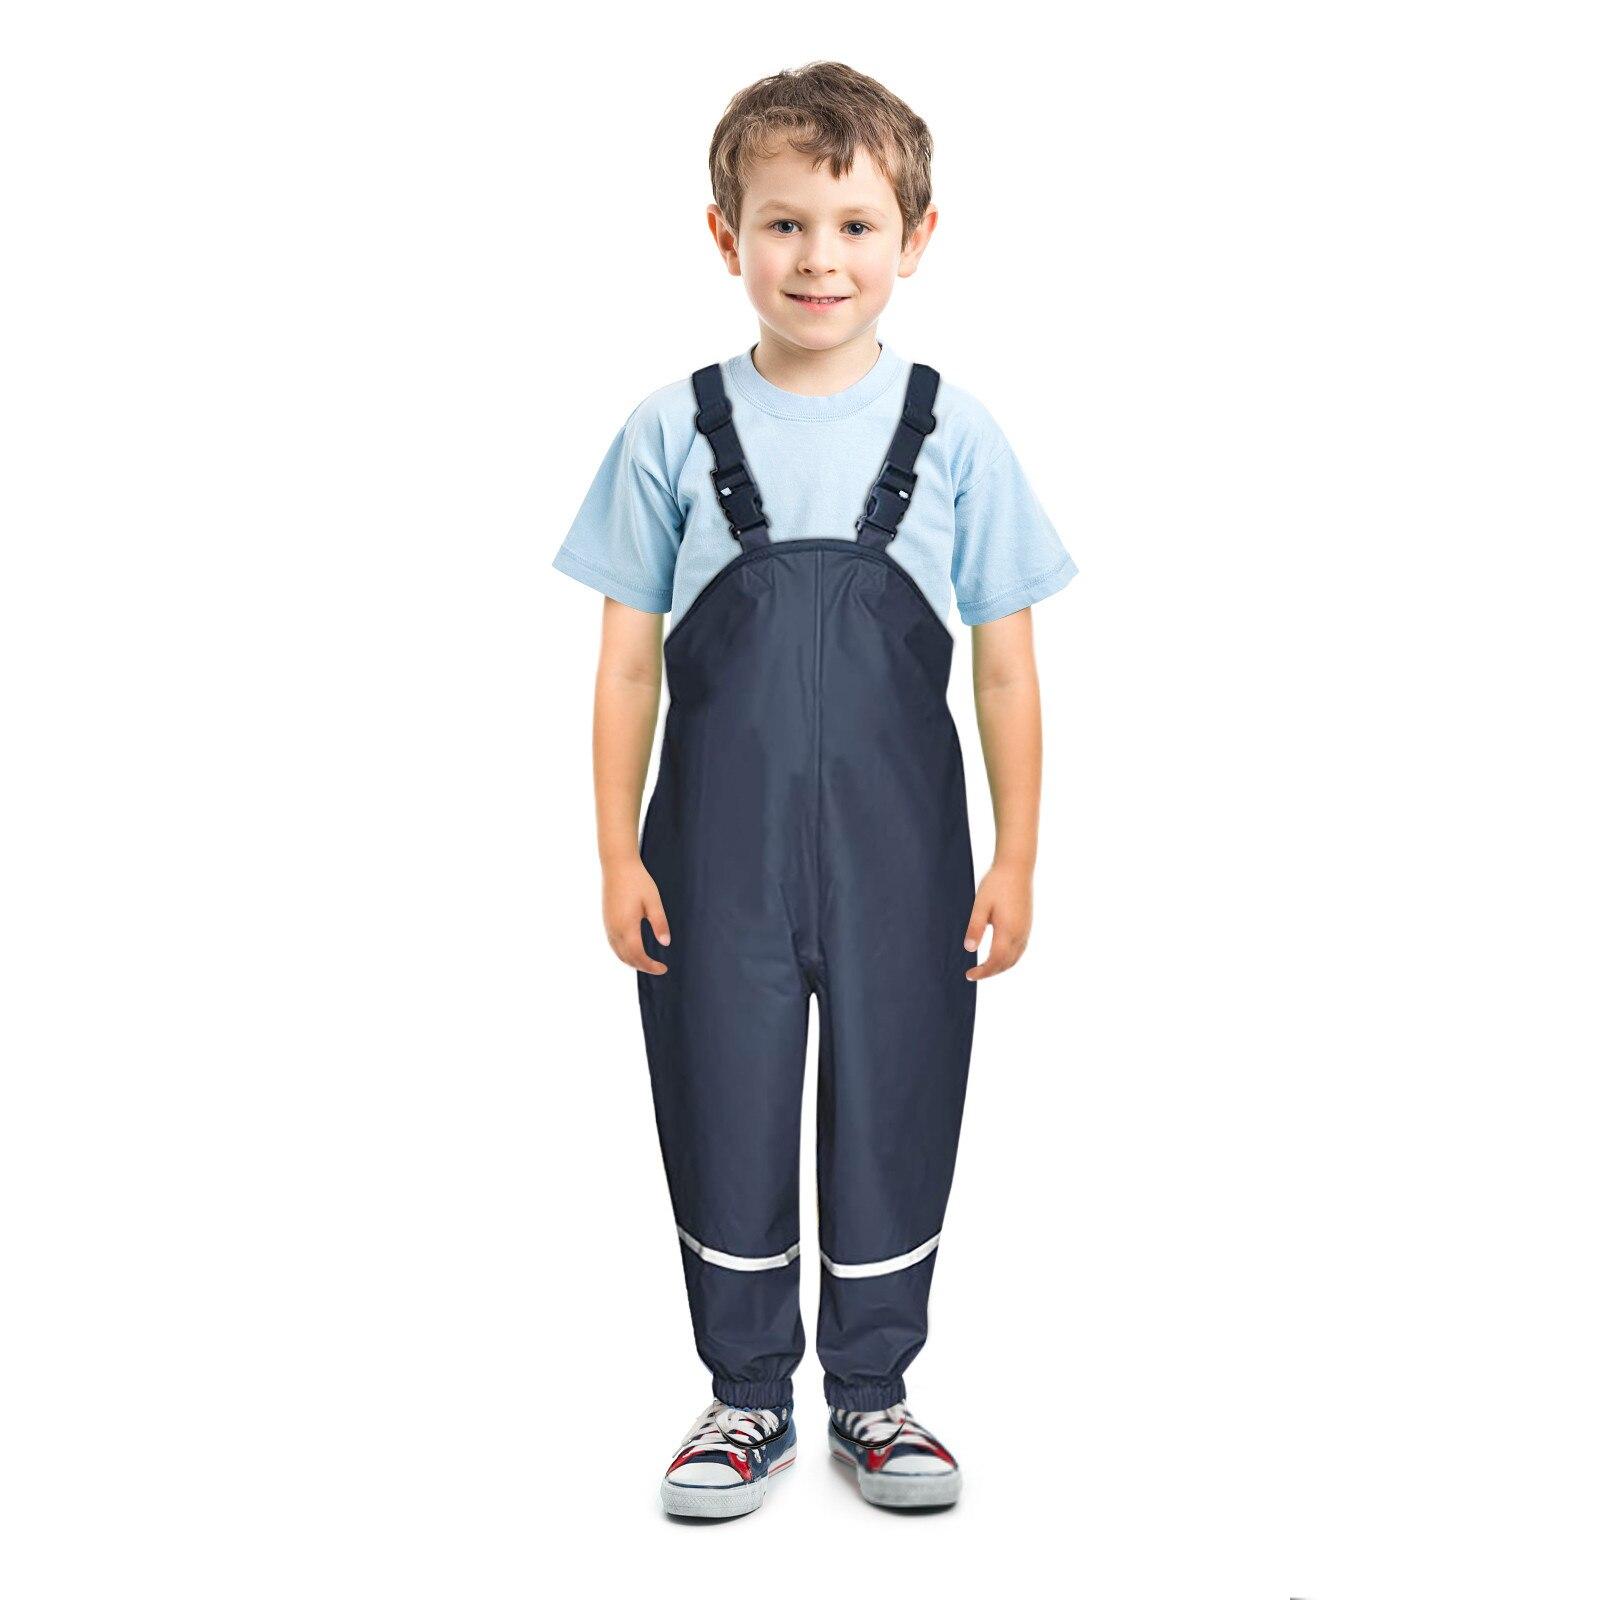 Unisex Children's Rain Dungarees Windproof and Waterproof Mud Trousers